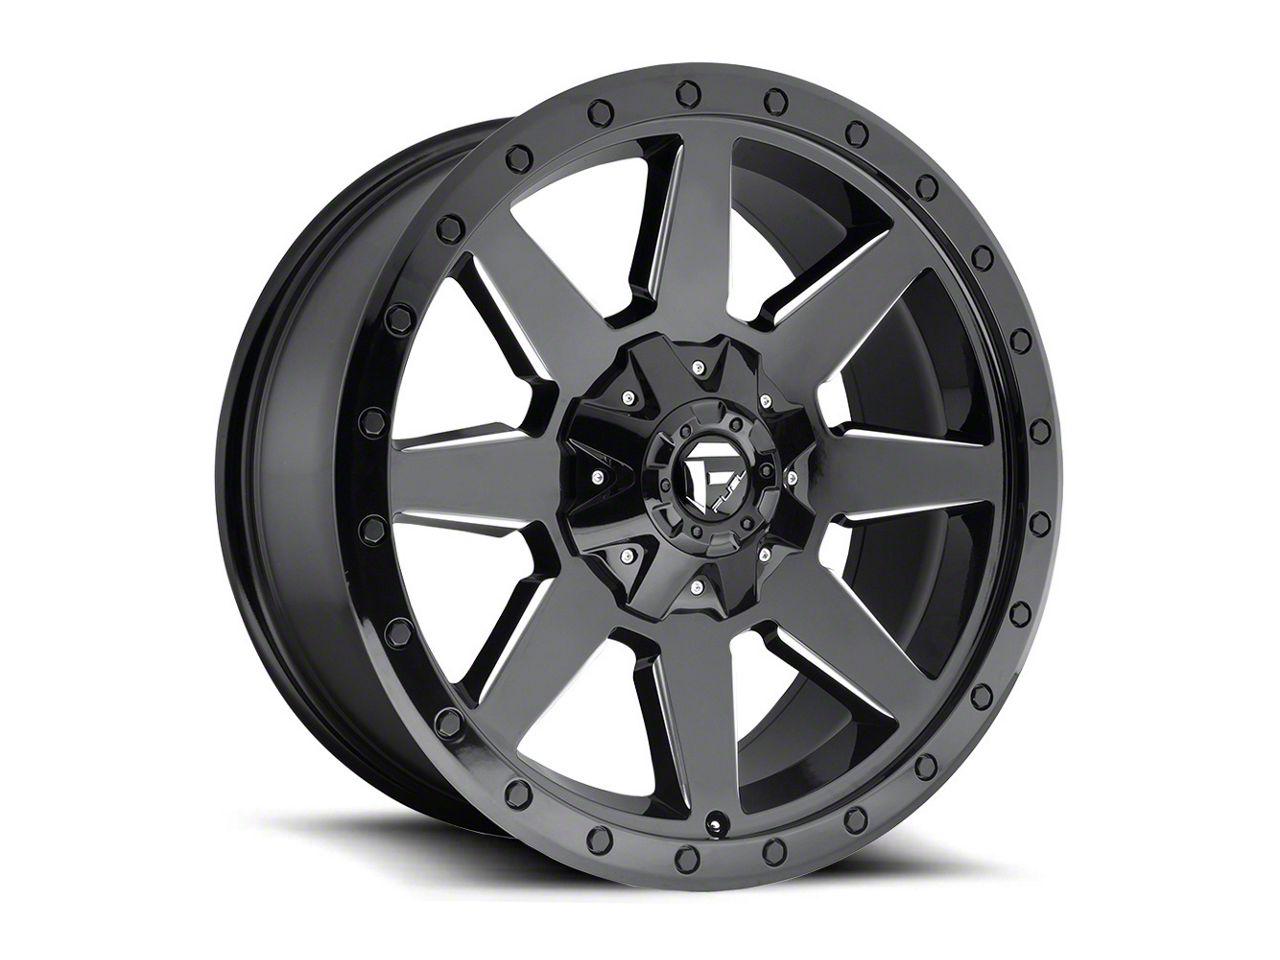 Fuel Wheels Wildcat Gloss Black Milled Wheel - 17x9 (87-06 Jeep Wrangler YJ & TJ)